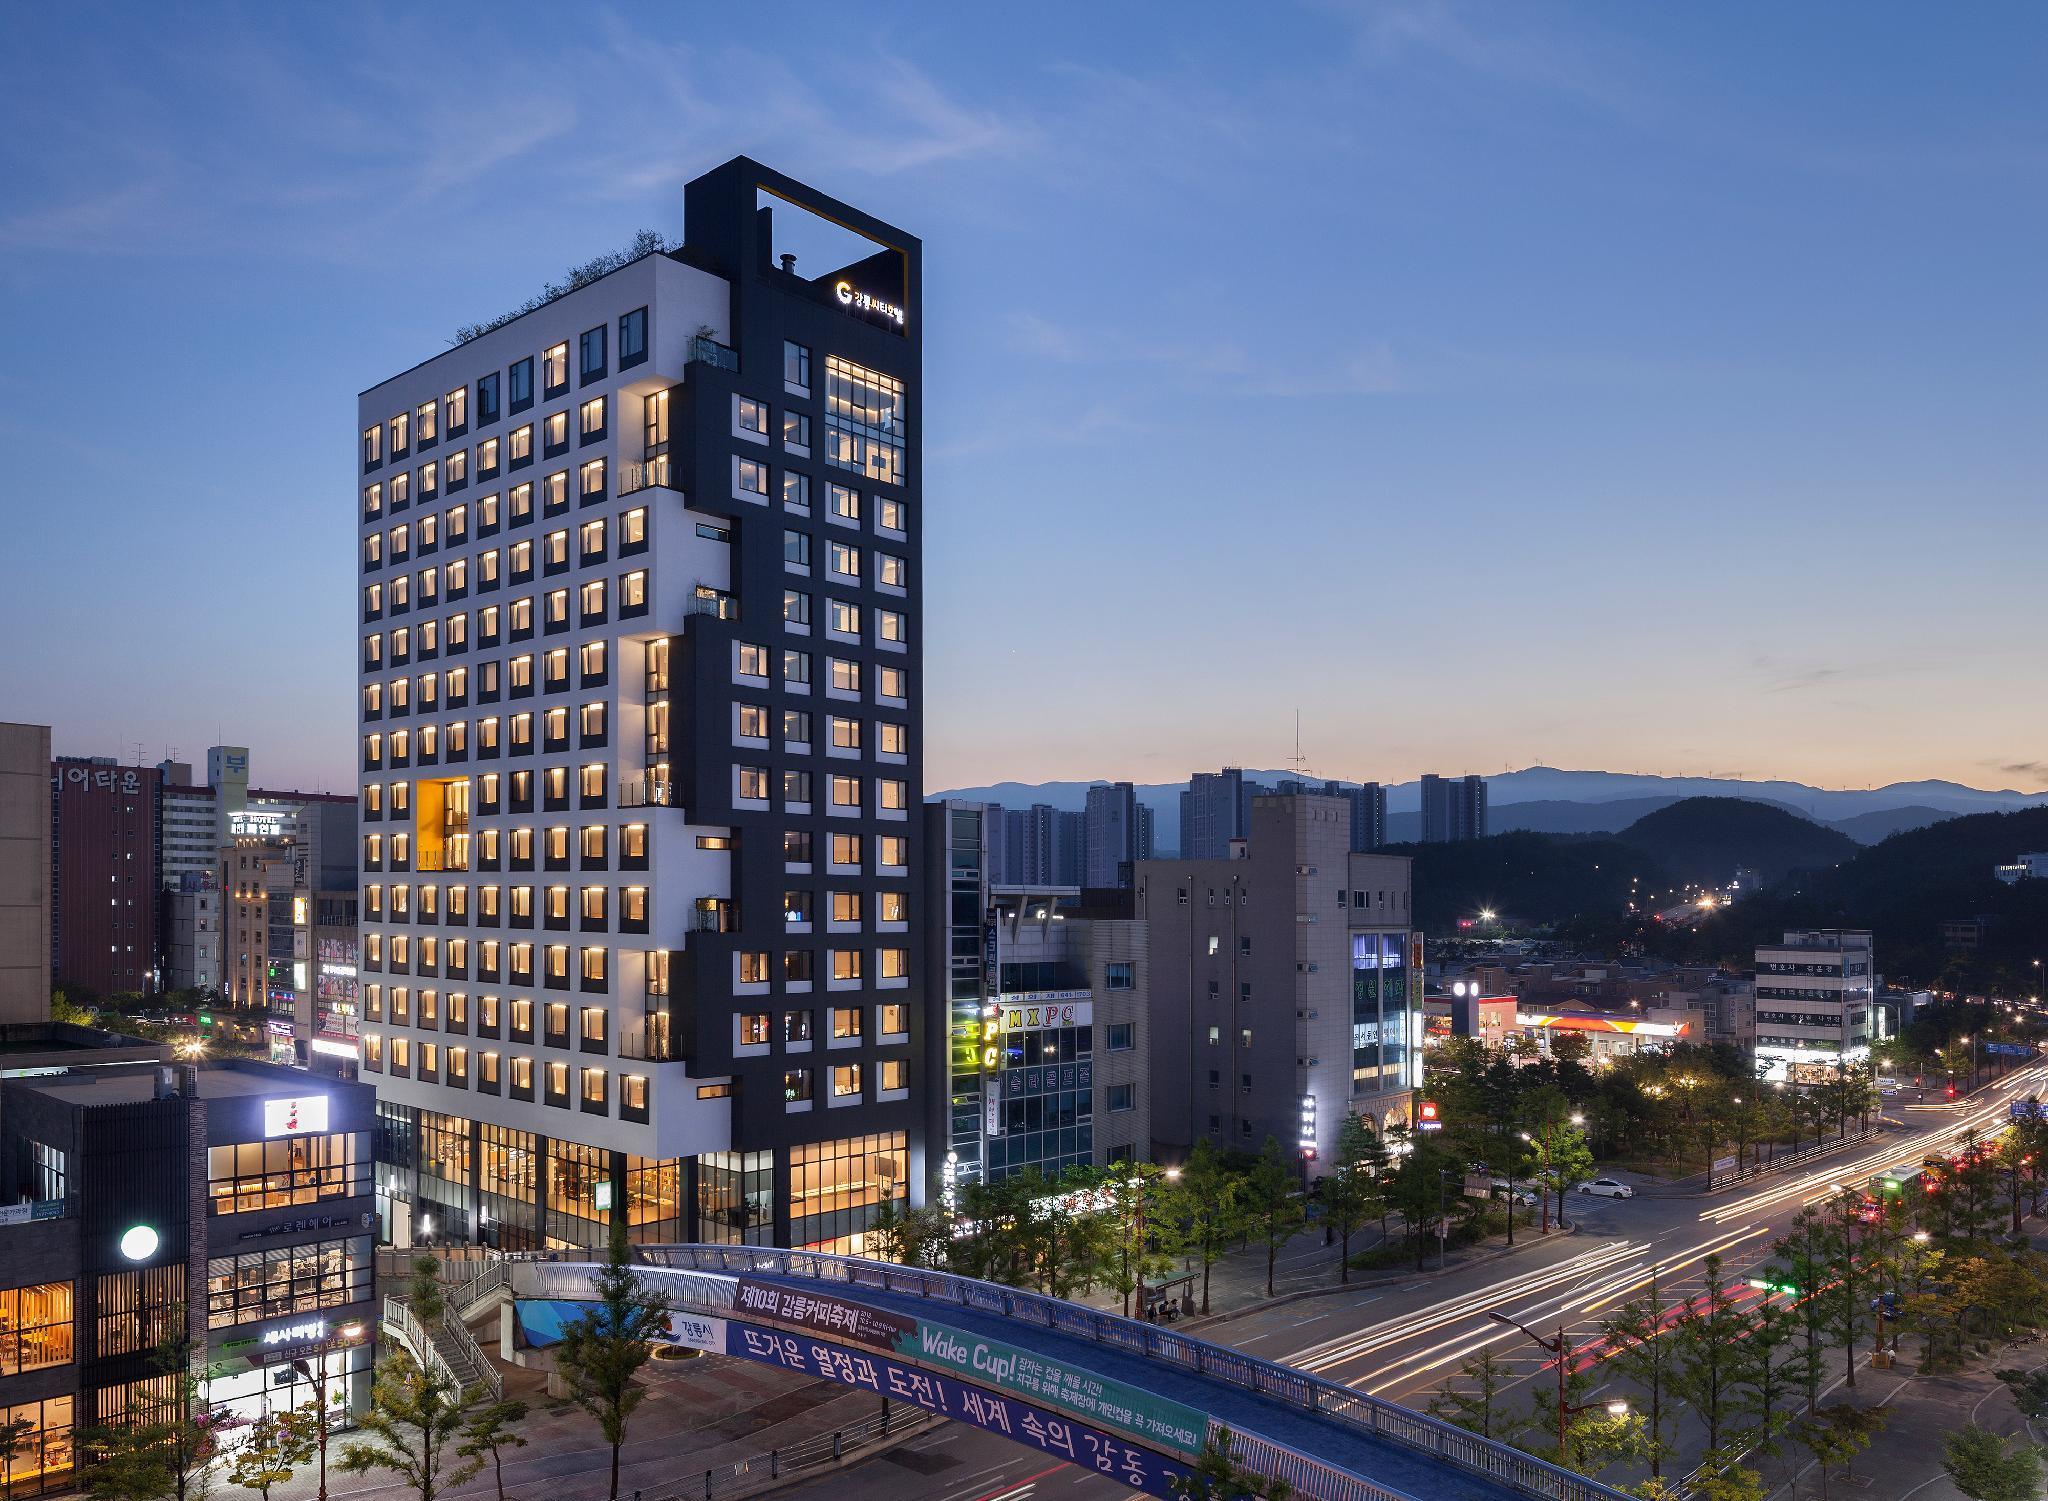 Gangneung City Hotel